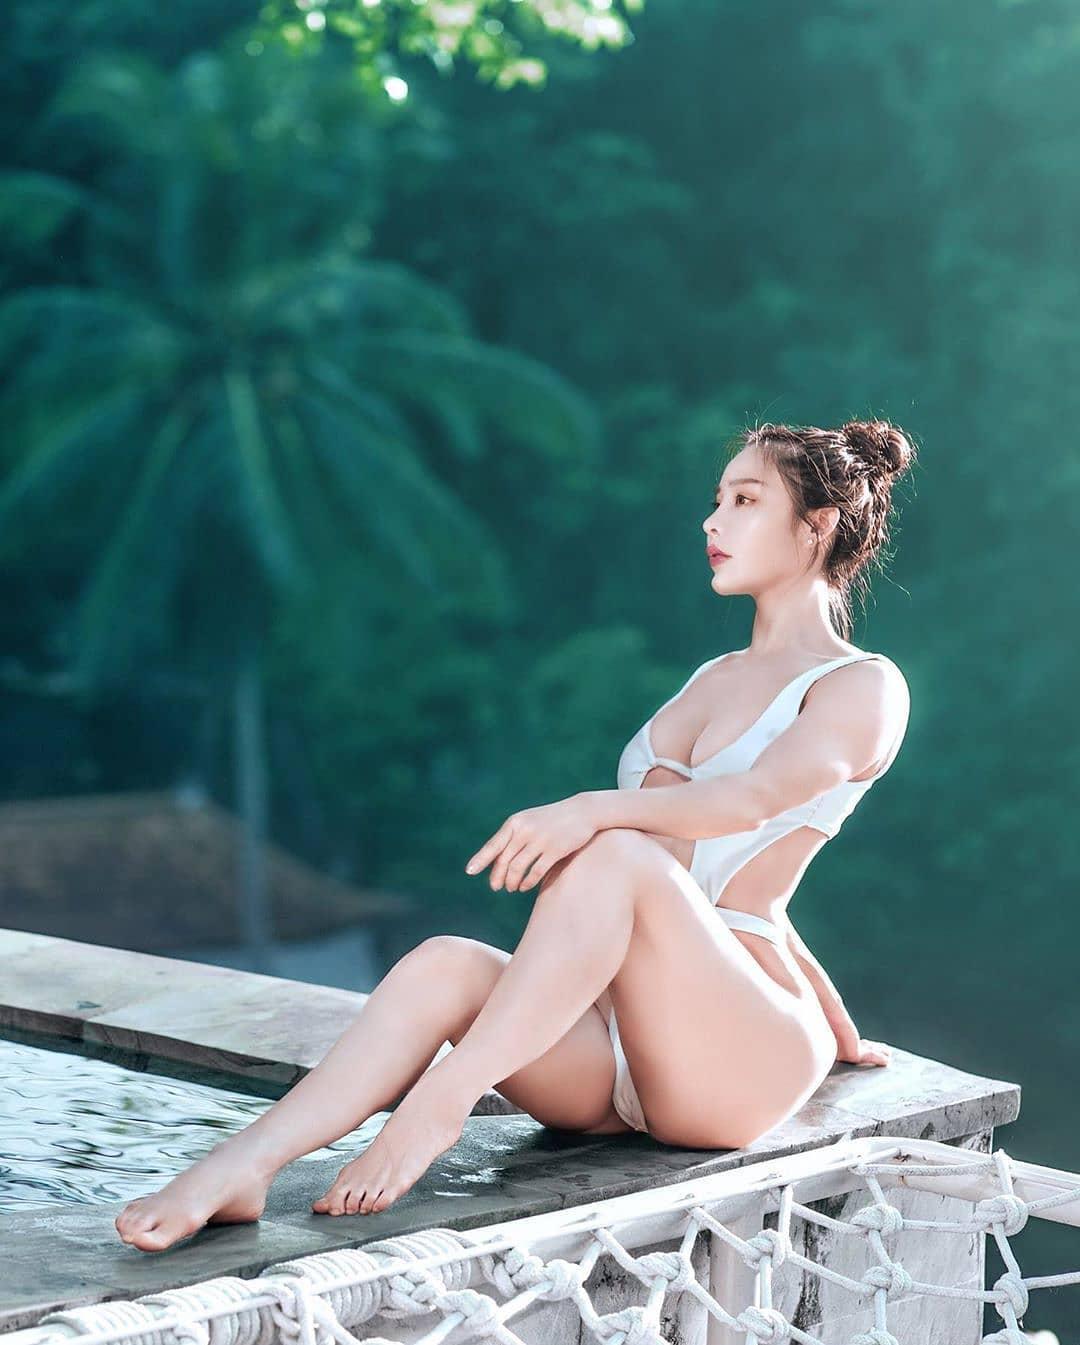 yuan herong 5 - elle man